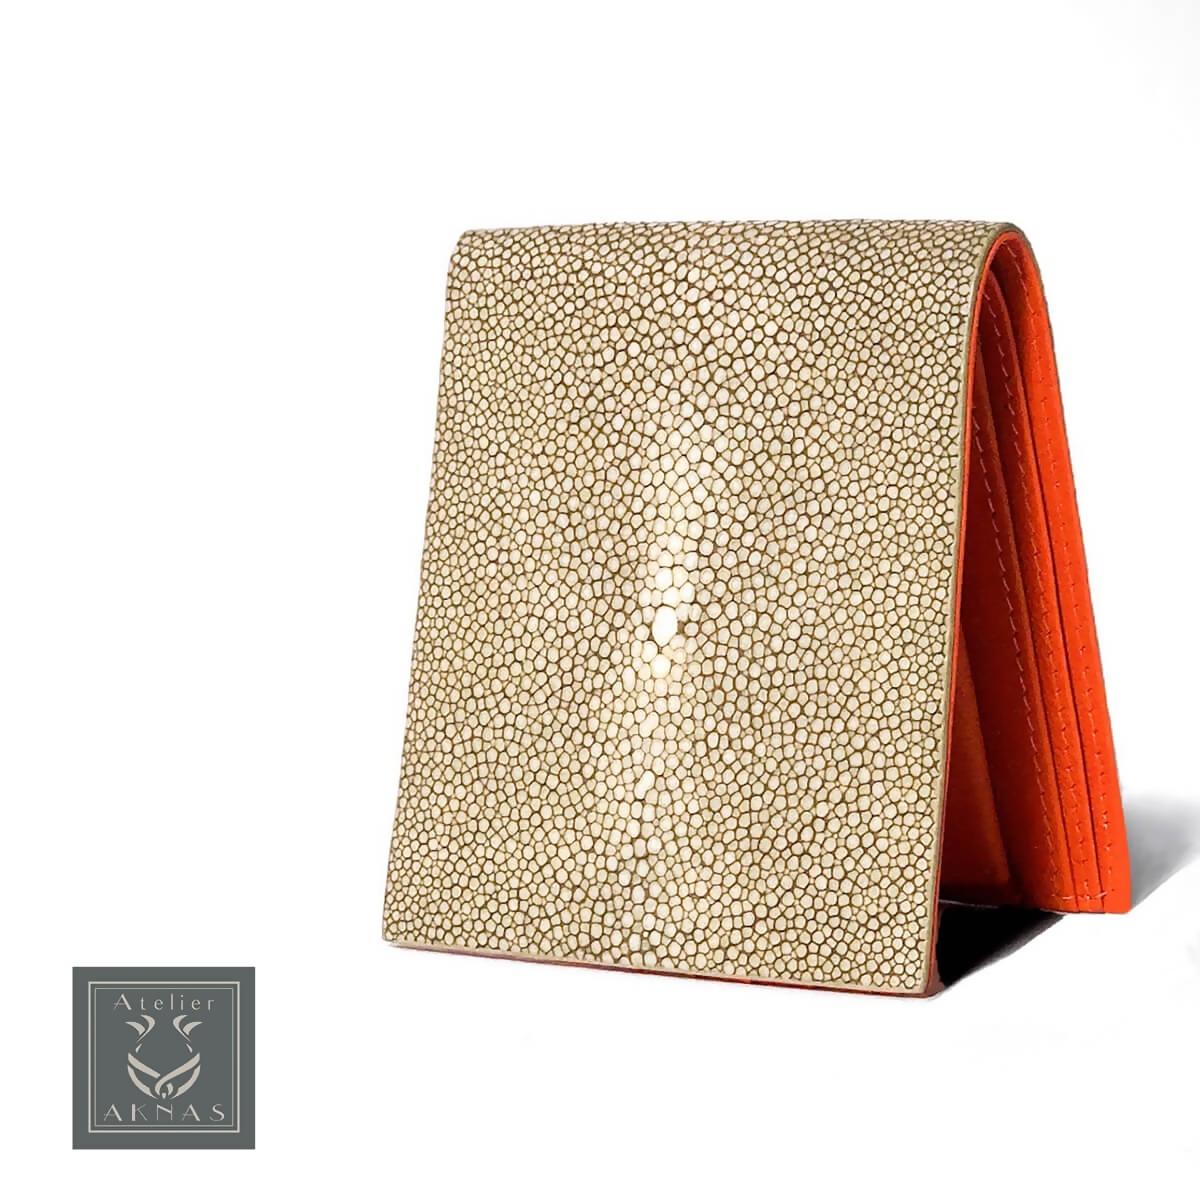 AKNAS (アクナス)財布 二つ折り財布 折り財布 エイ革 スティングレイ ガルーシャ エキゾチックレザー おしゃれ 高級 フランス タイ製